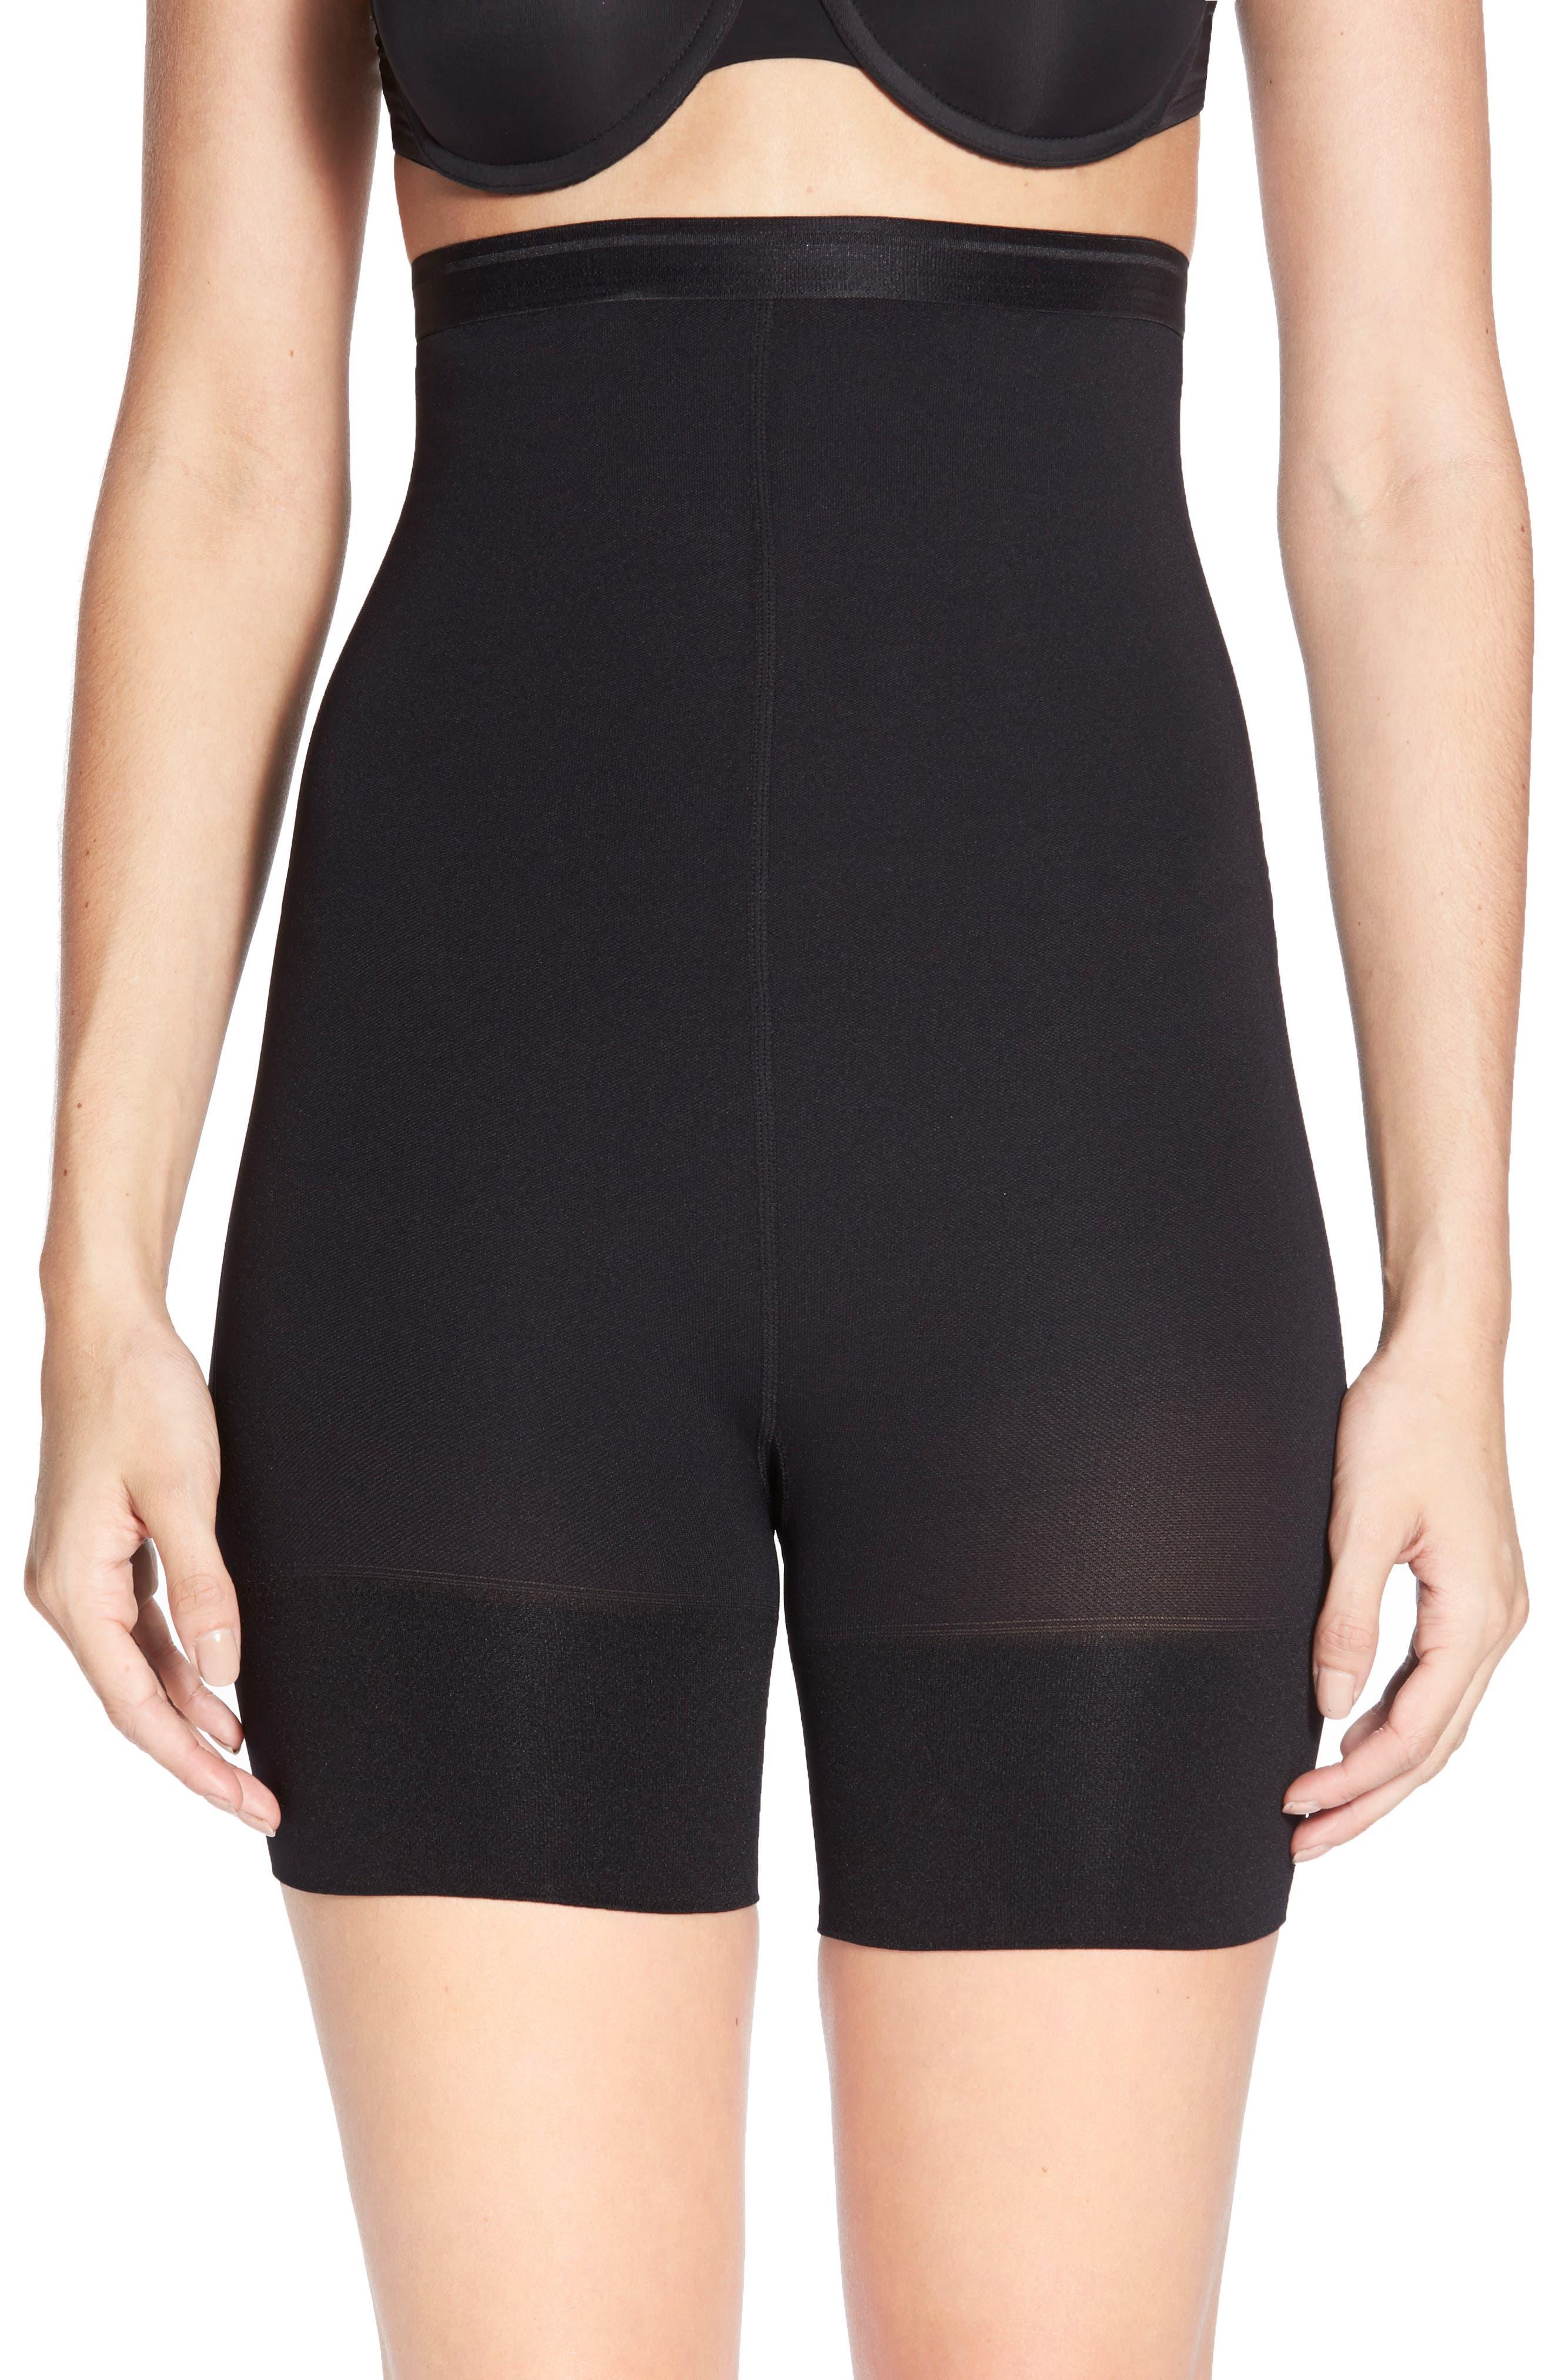 Shorty Shaping Shorts,                             Alternate thumbnail 2, color,                             BLACK